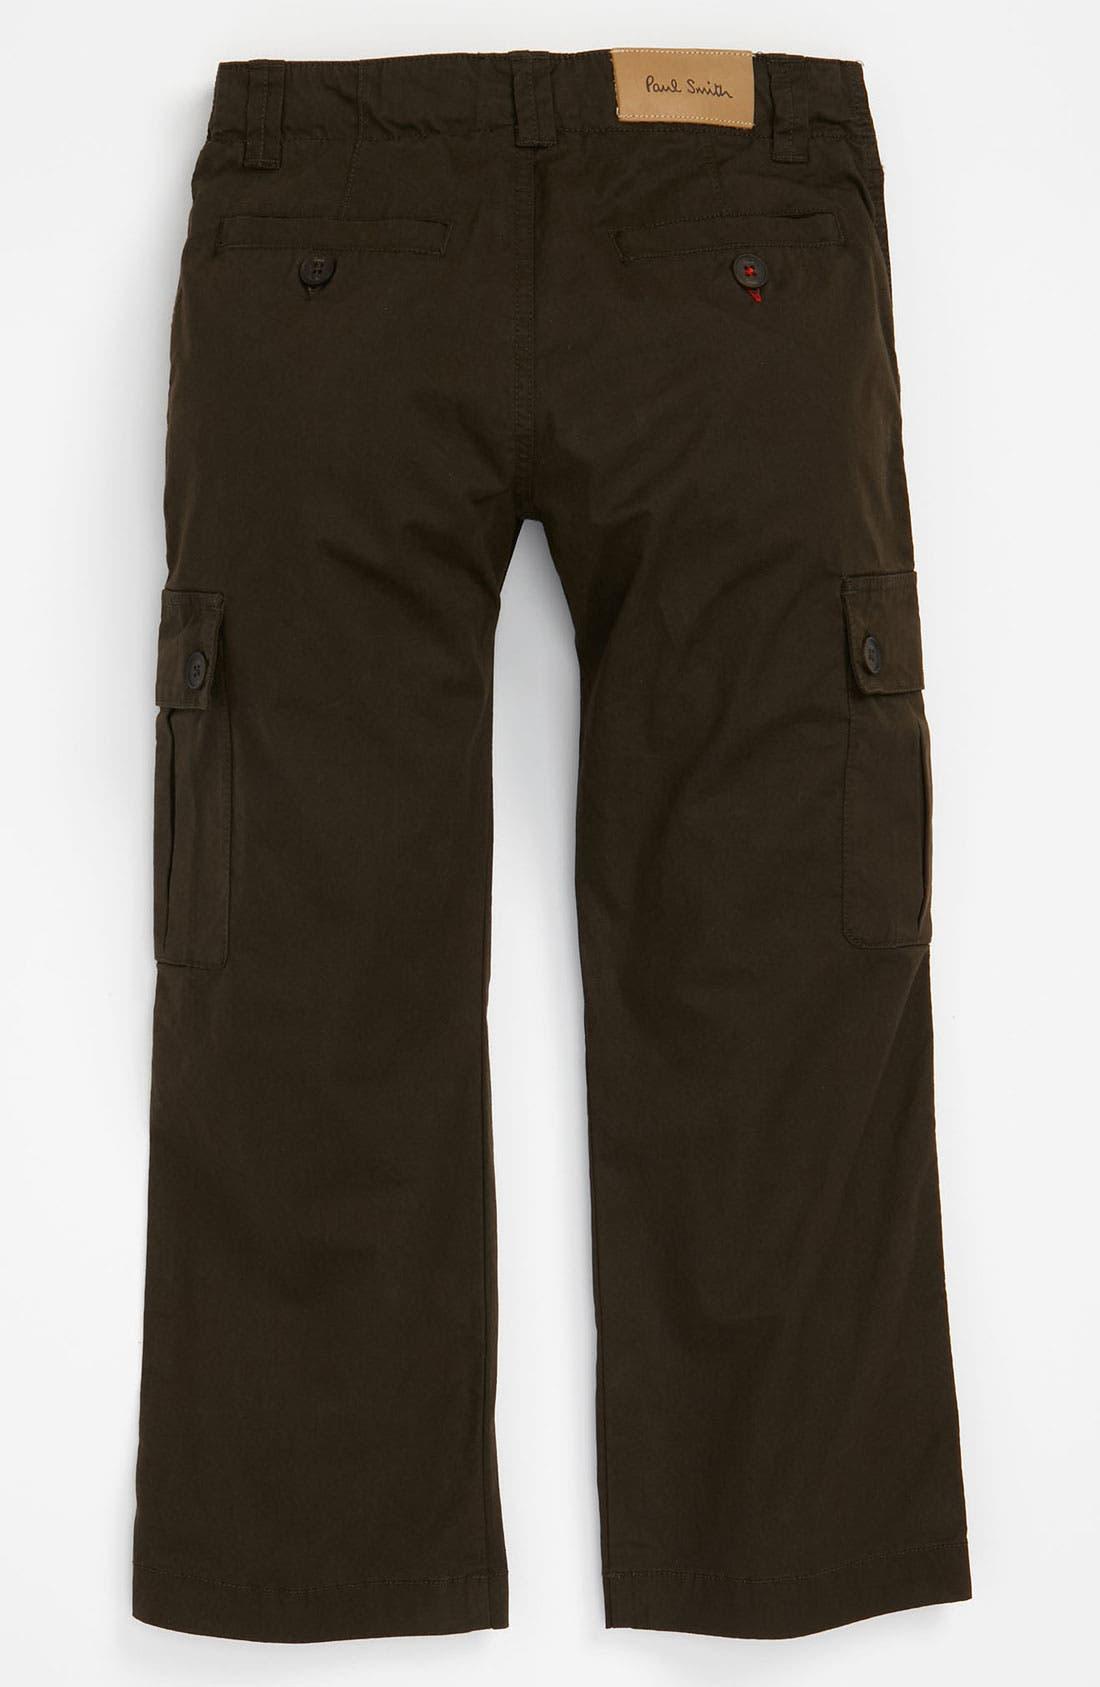 Alternate Image 1 Selected - Paul Smith Junior 'Calisto' Cargo Pants (Little Boys)